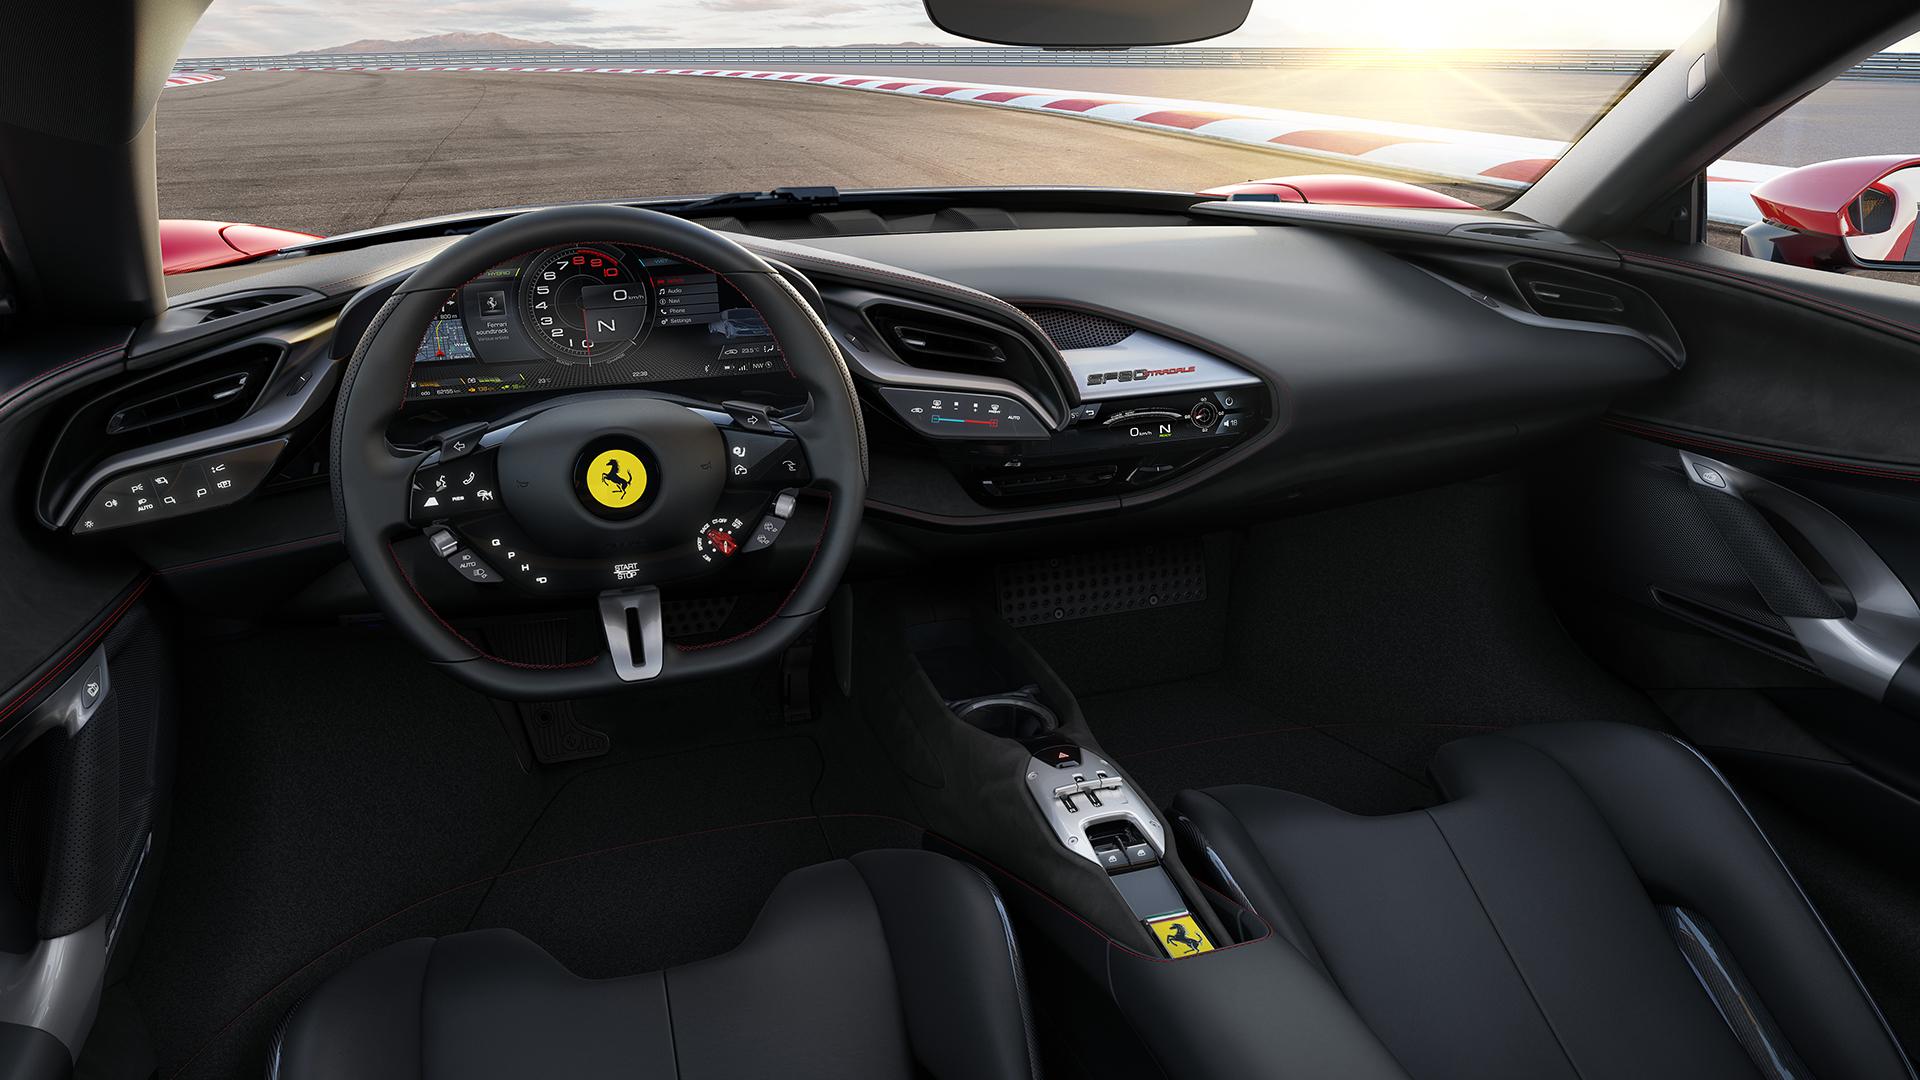 190165-car-Ferrari-SF90-Stradale.jpg